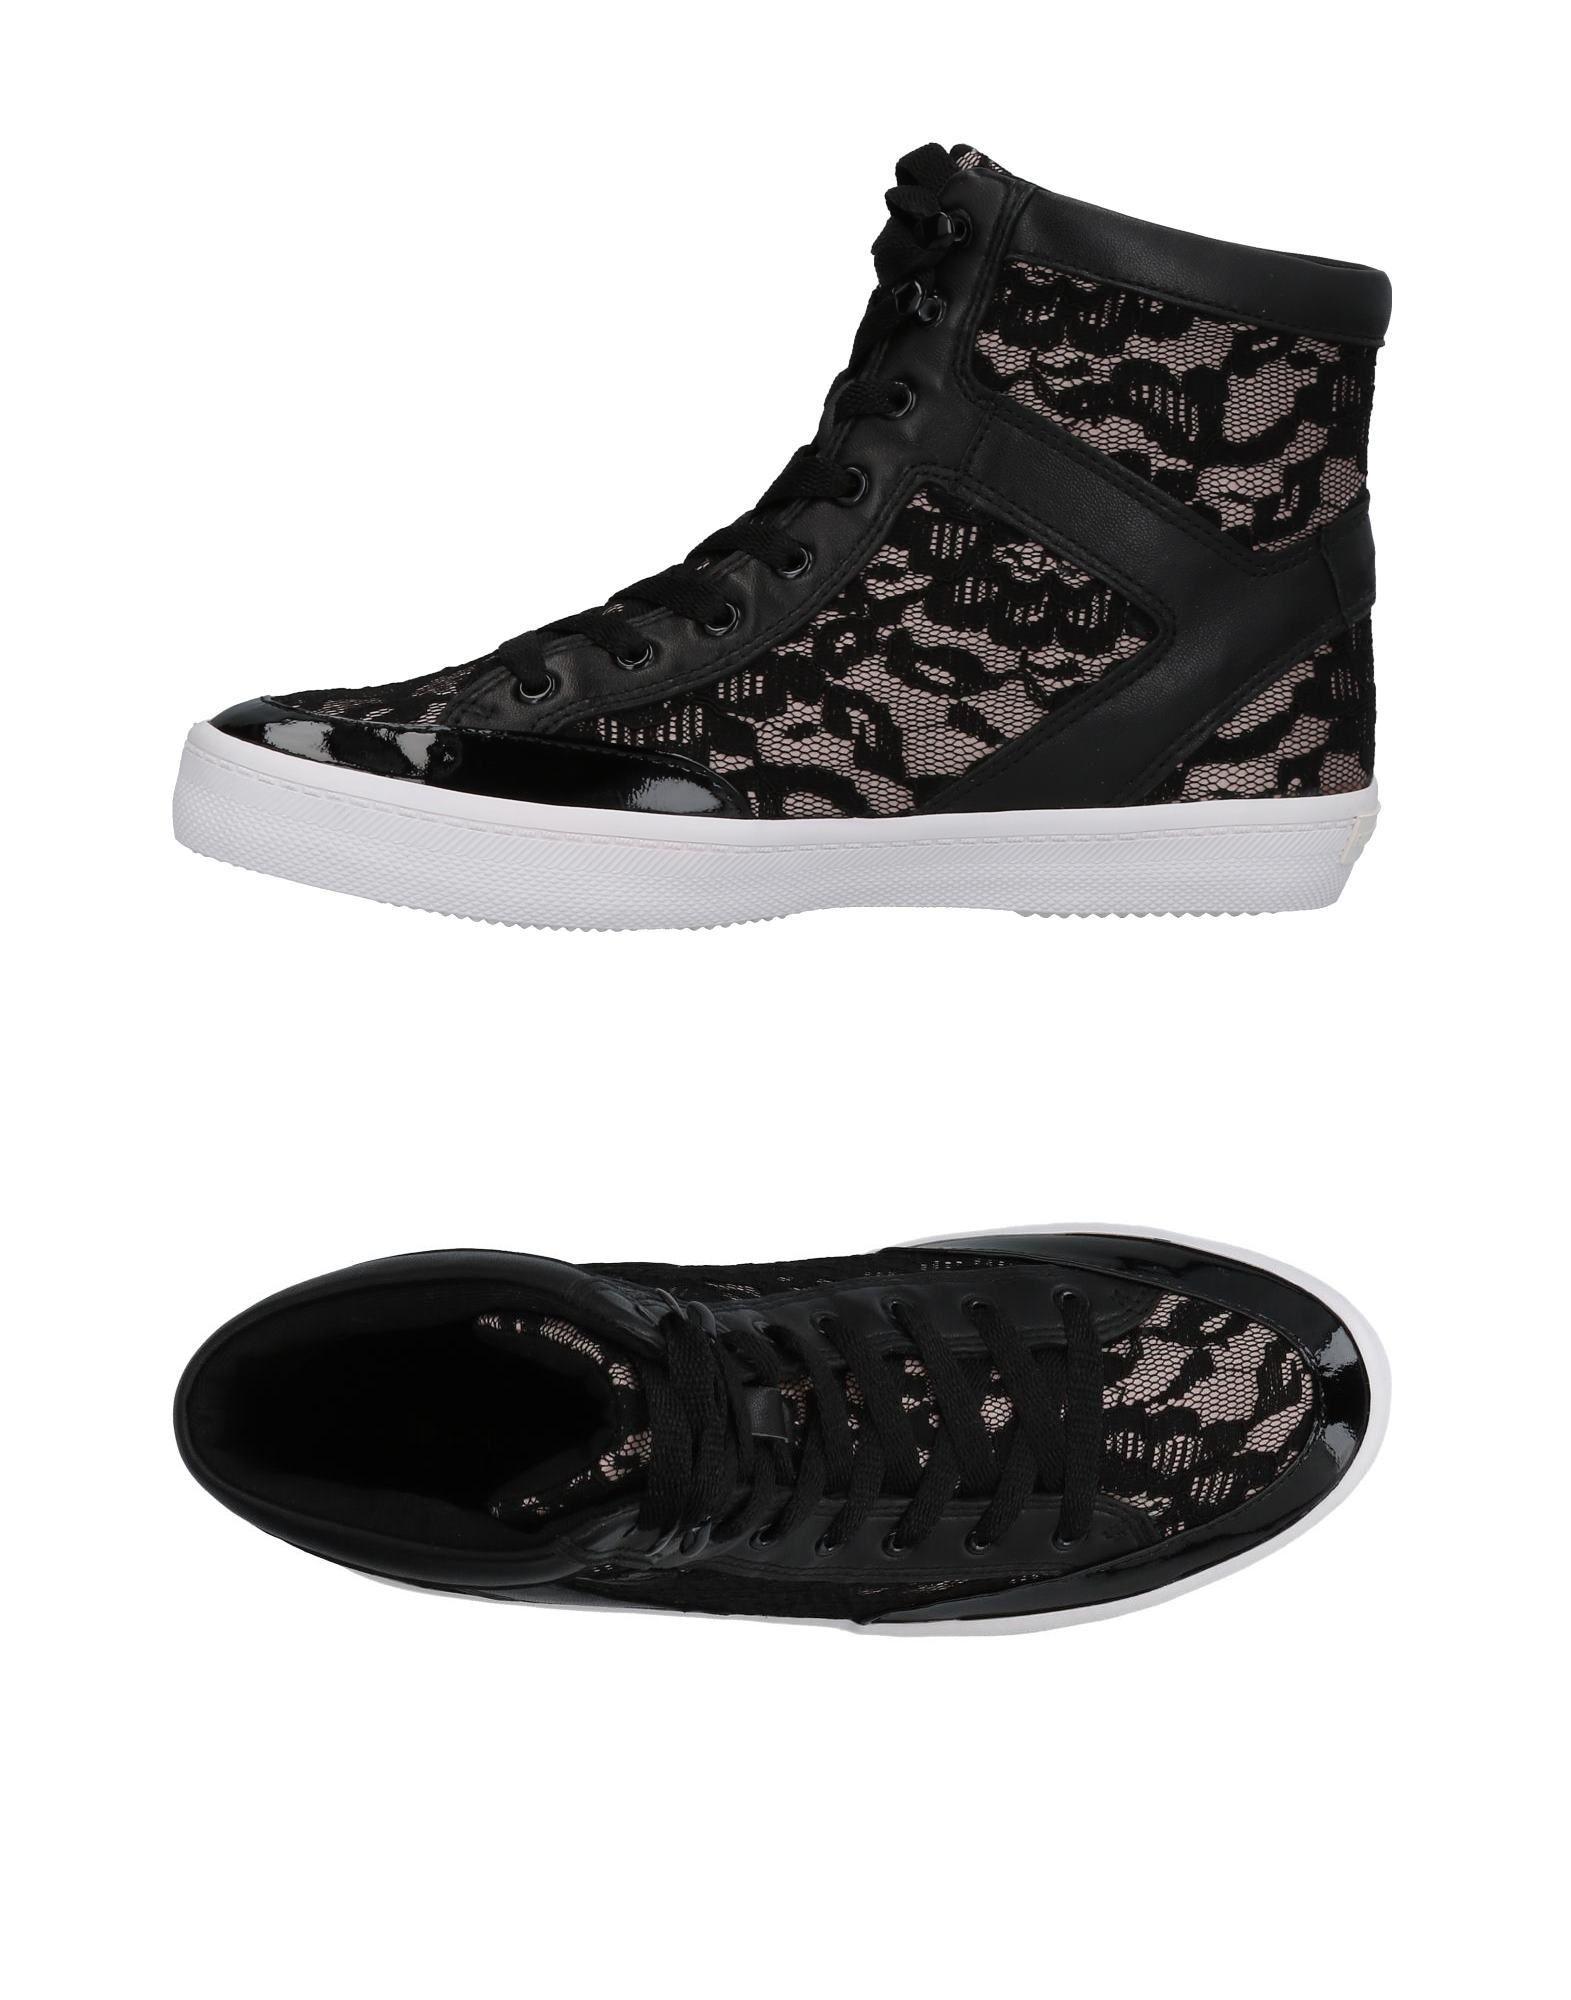 Baskets Rebecca Minkoff Femme - Baskets Rebecca Minkoff Noir Dernières chaussures discount pour hommes et femmes